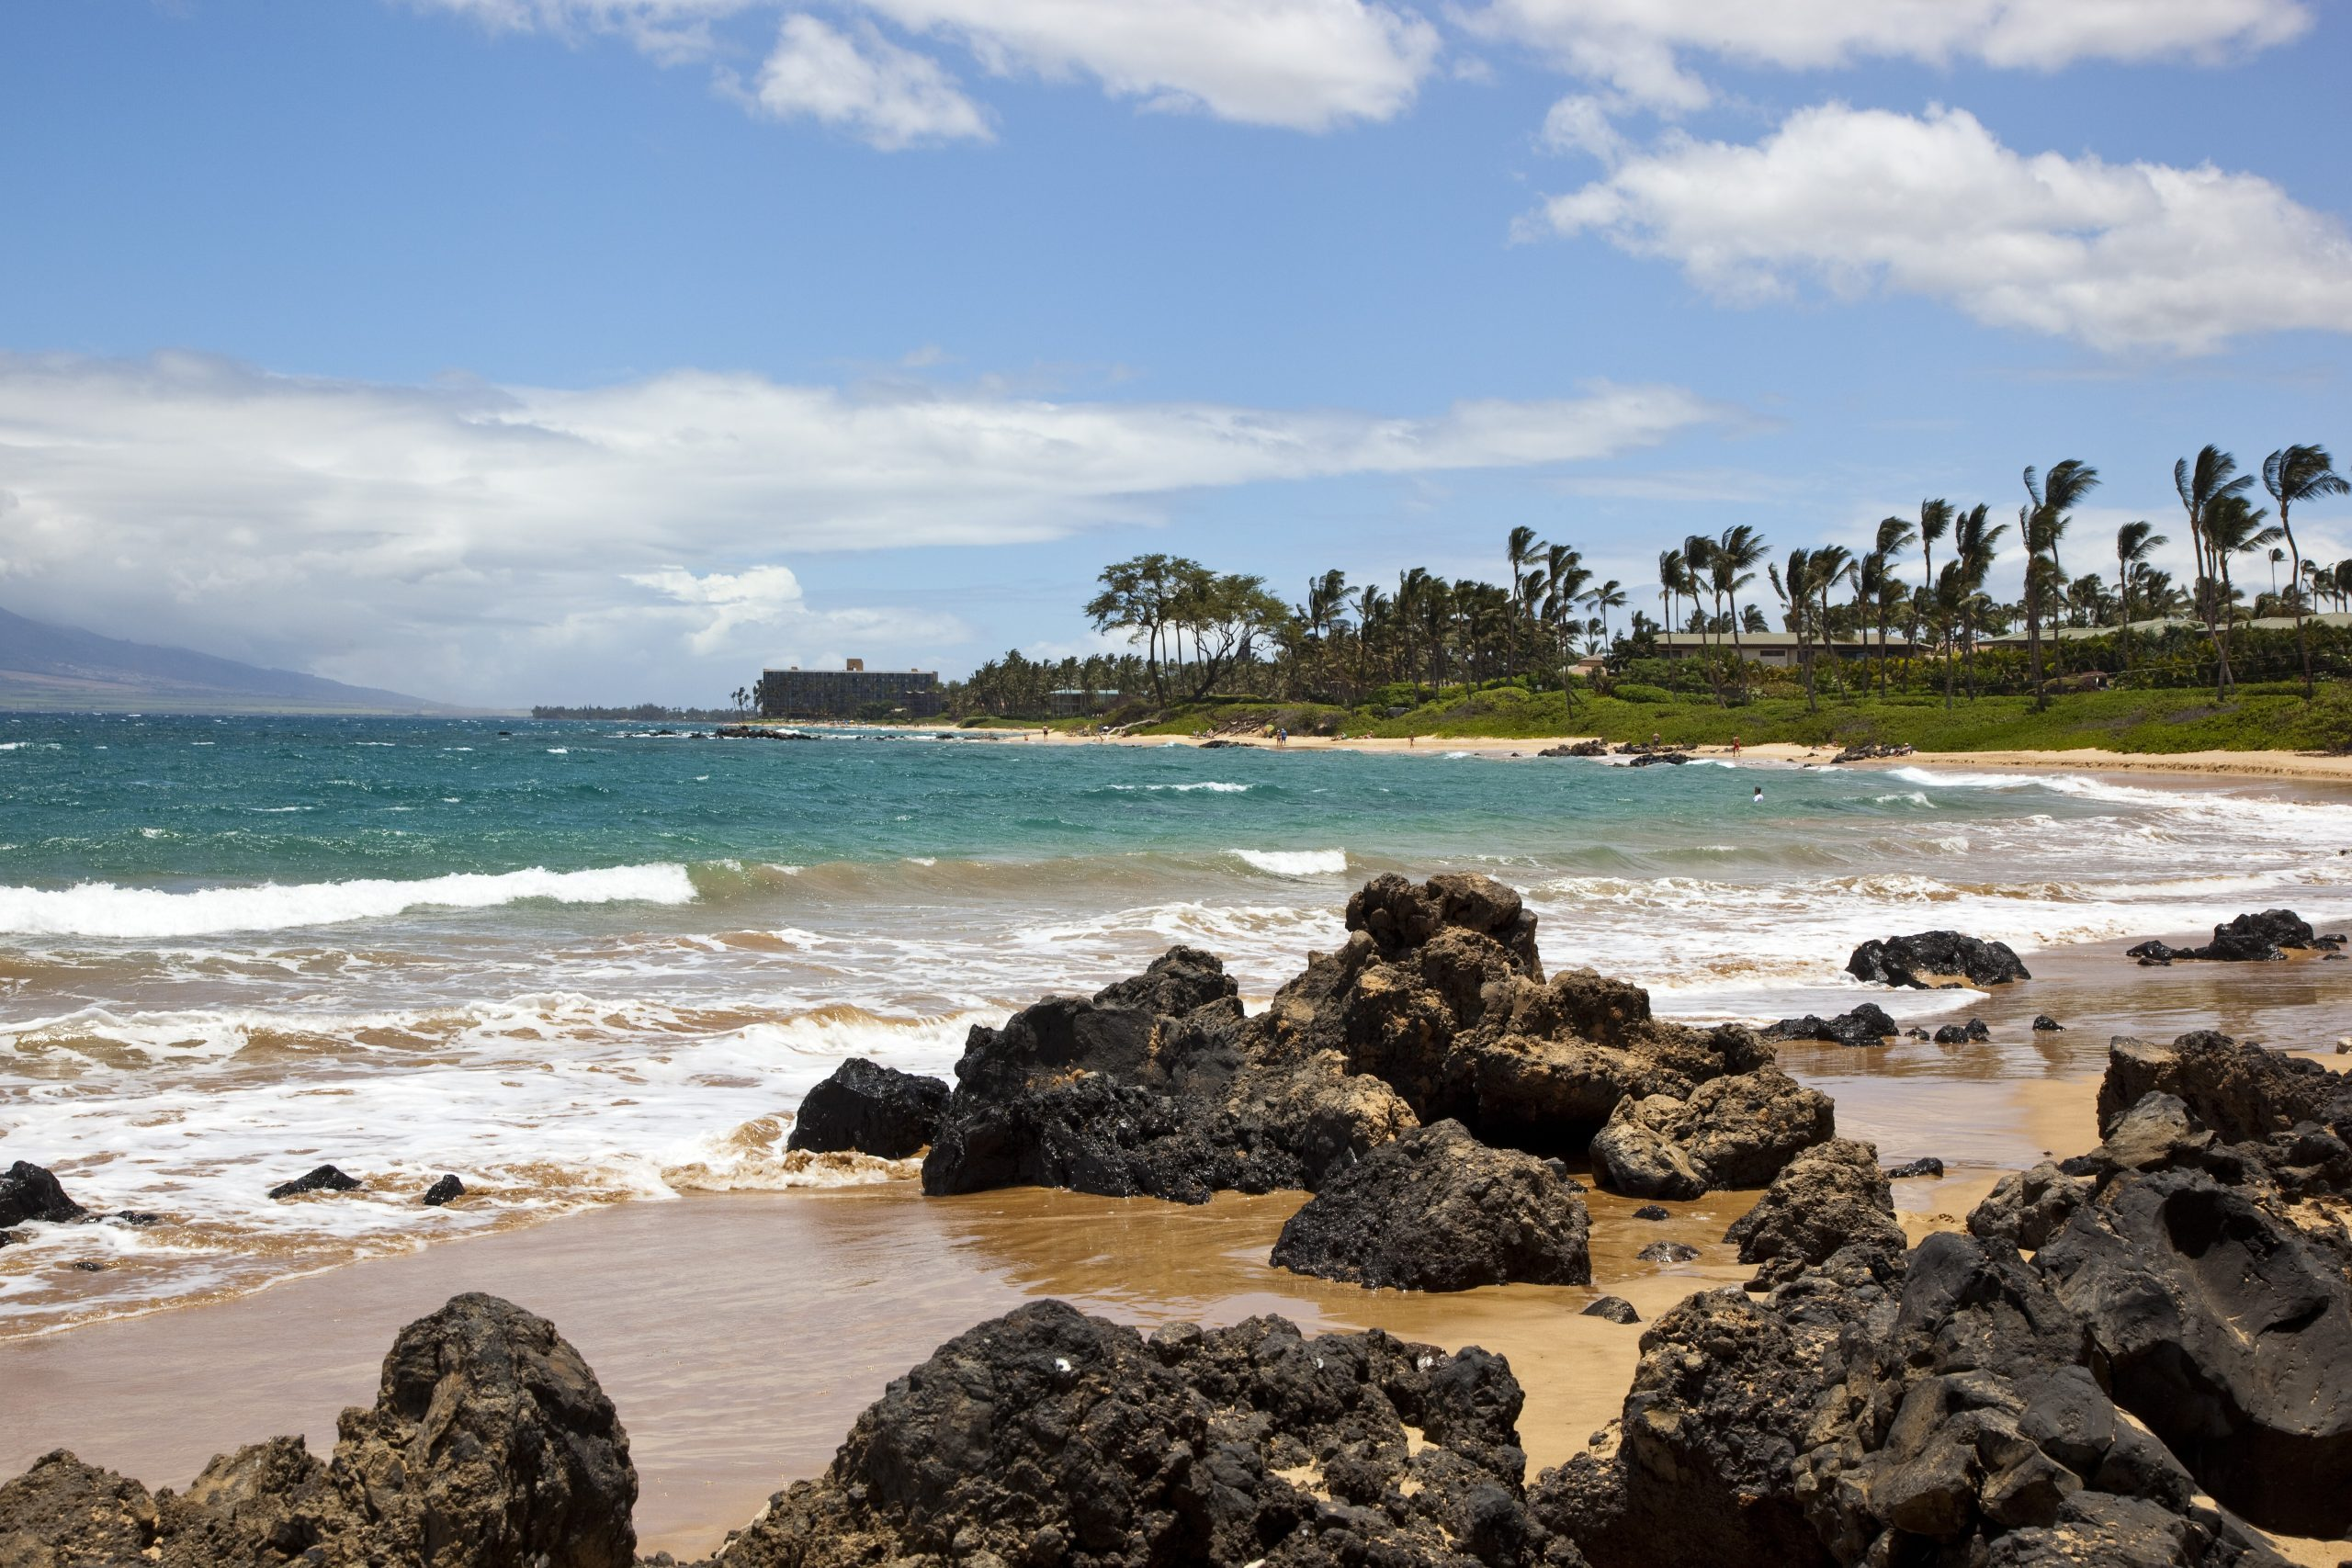 Surf crashing against rocks on a beach in Wailea, Maui, Hawaii